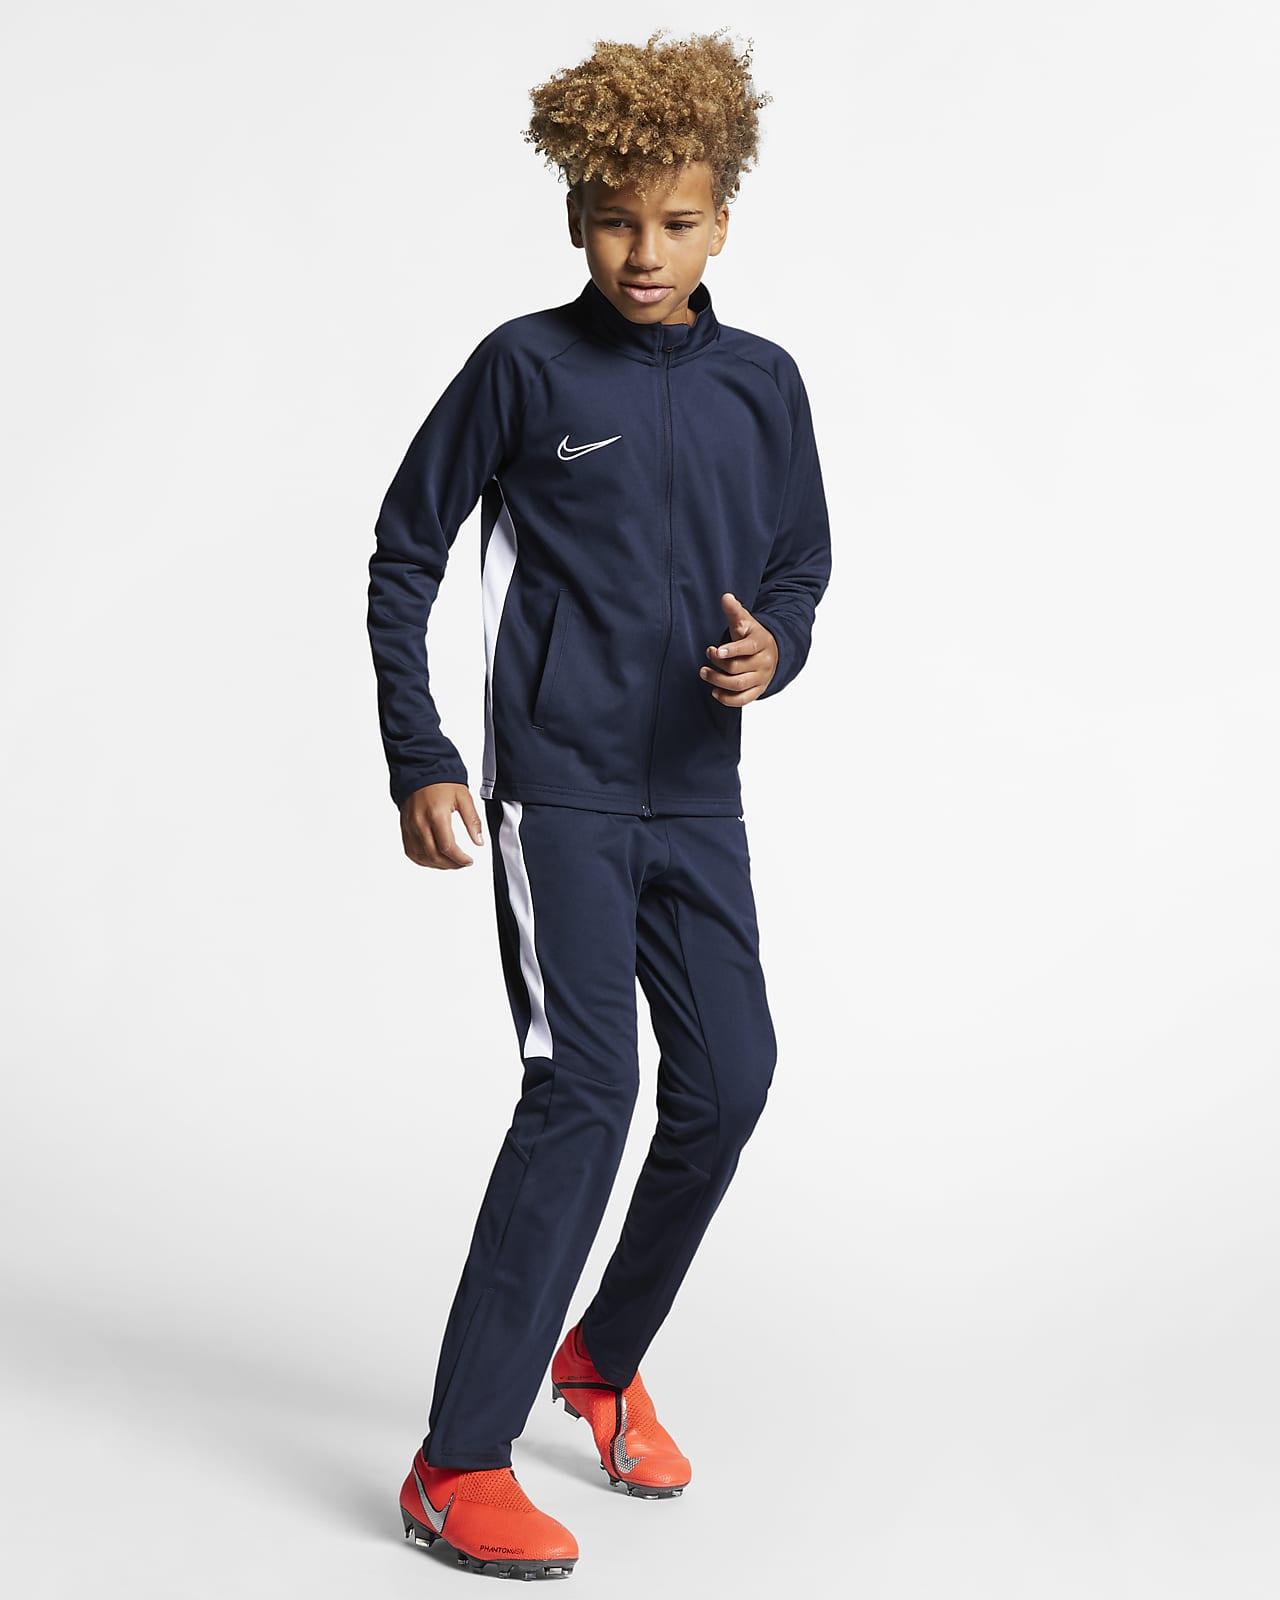 Fotbollstracksuit Nike Dri-FIT Academy för ungdom